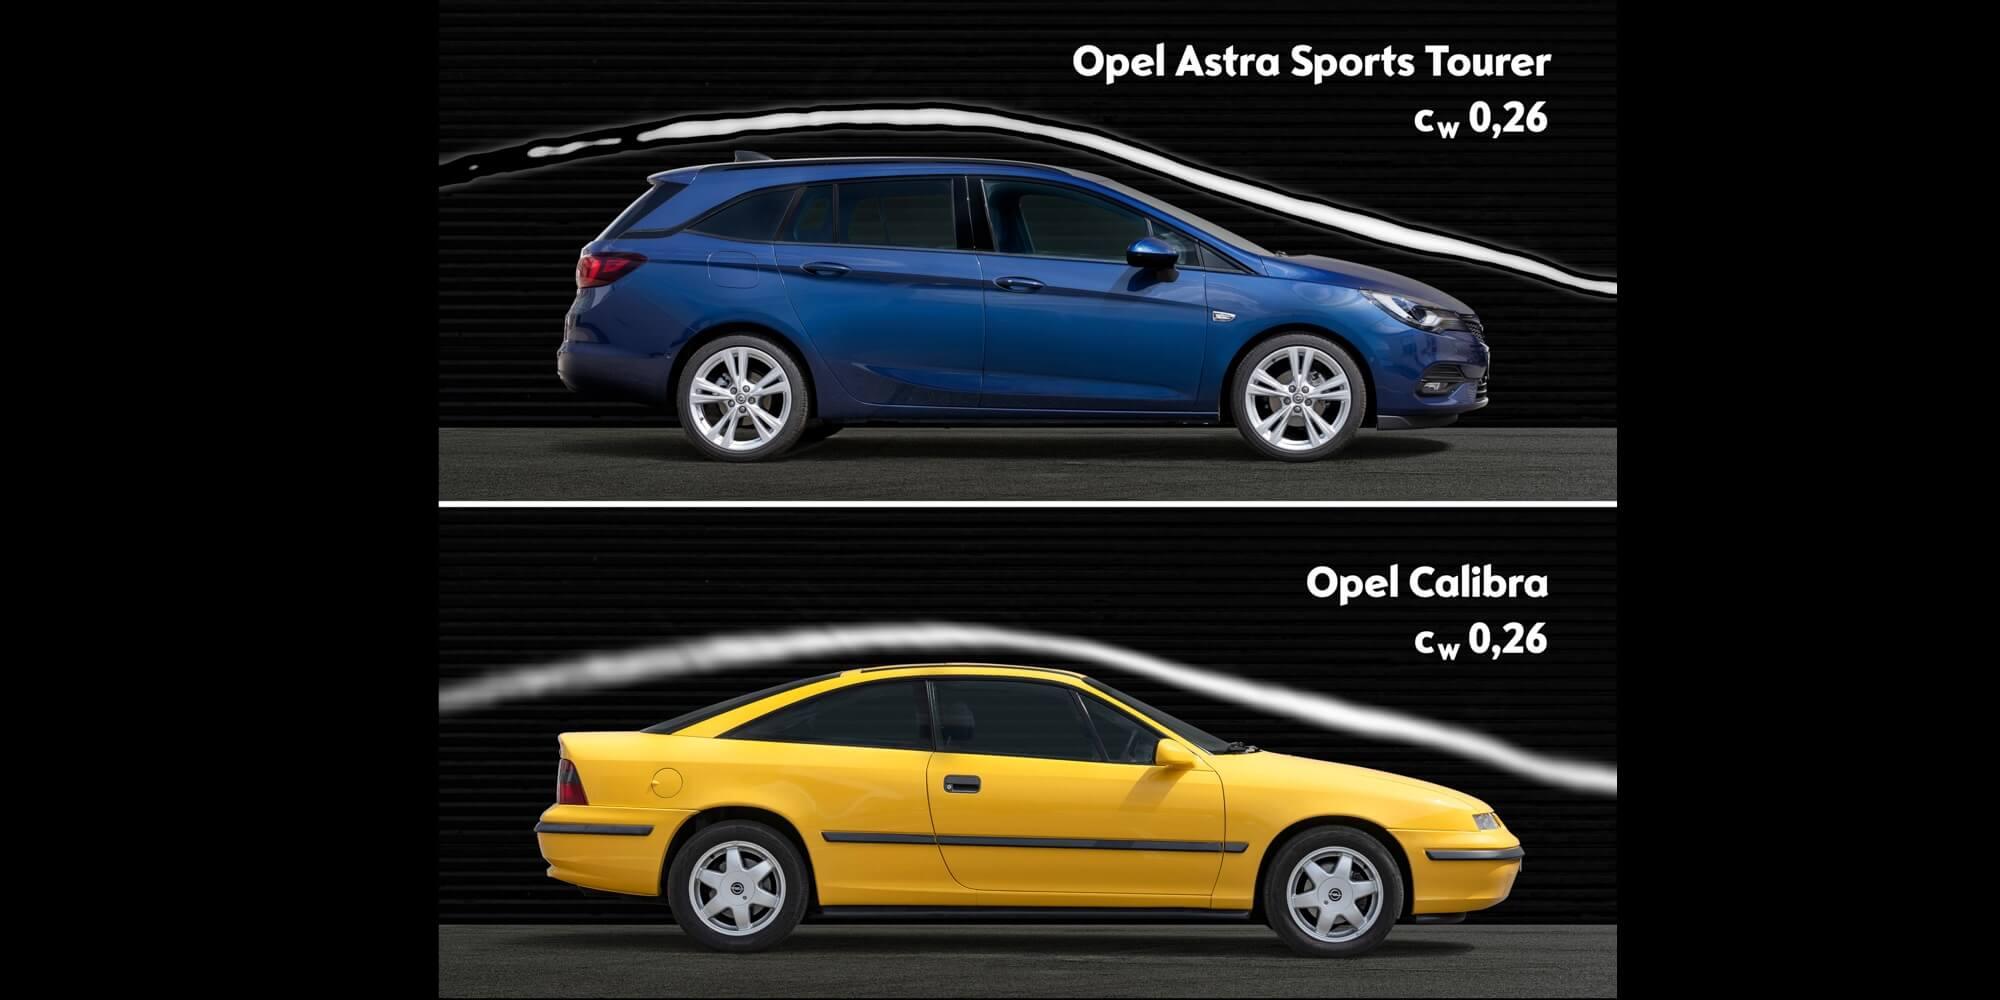 Opel Astra Opel Calibra